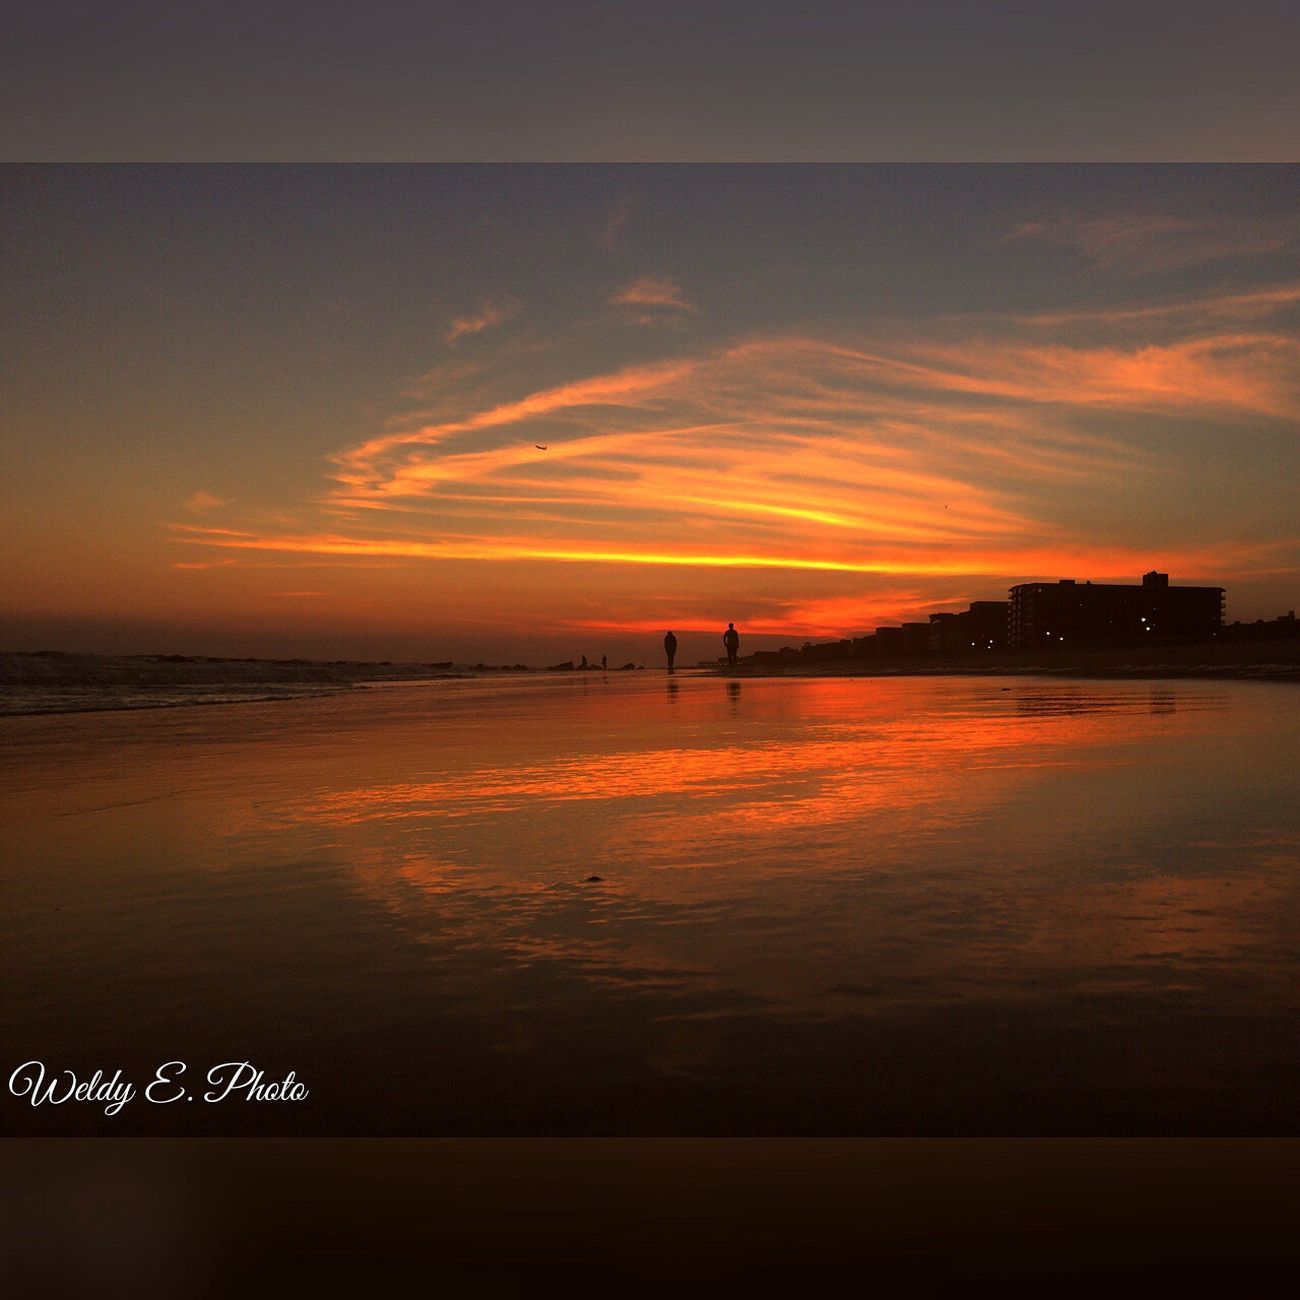 Sunset At Long Beach, NY Sunset_collection EyeEm Sunset Visualmagic Sky Collection Beautiful Sky EyeEm Best Shots Splendid_reflections Beachphotography Popular Photos